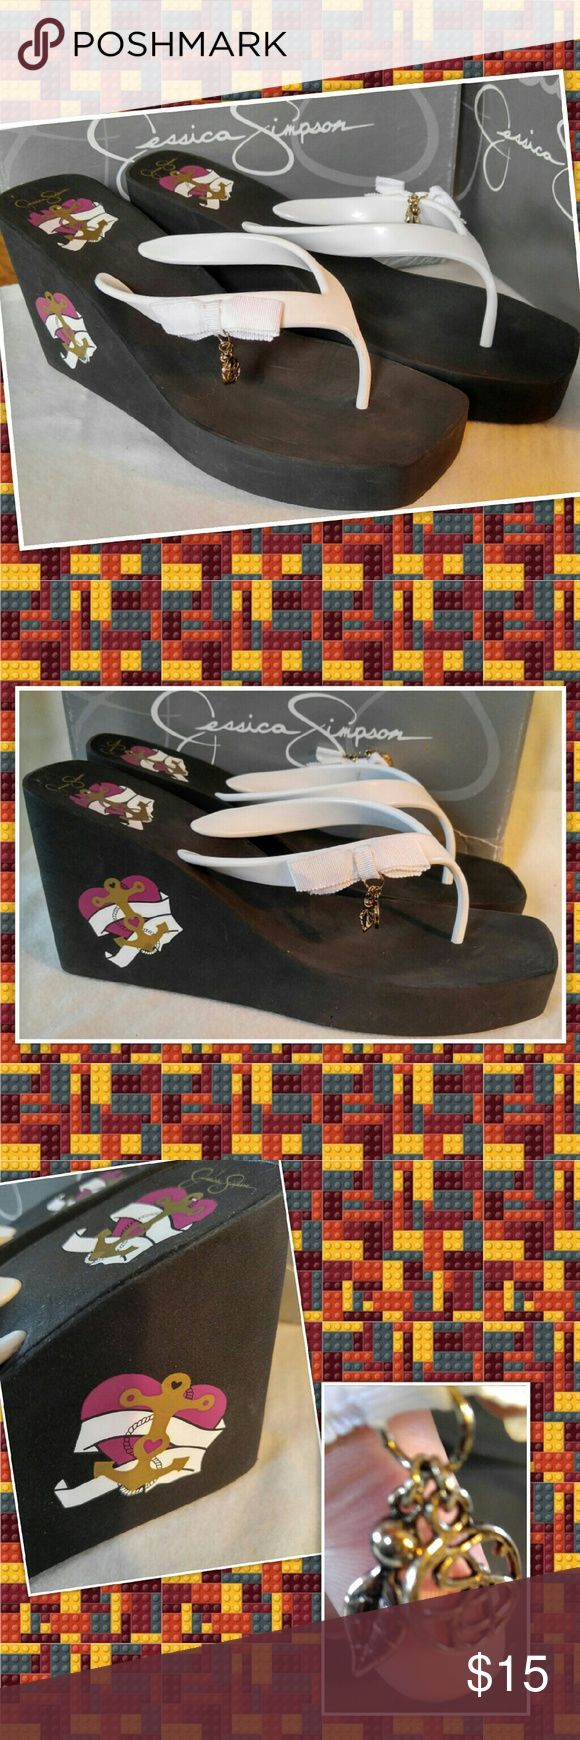 Jessica Simpson TICCA Wedges Sandals flip flops Jessica Simpson  TICCA  Wedges Sandals flip flops  Worn once Size 10 Jessica Simpson Shoes